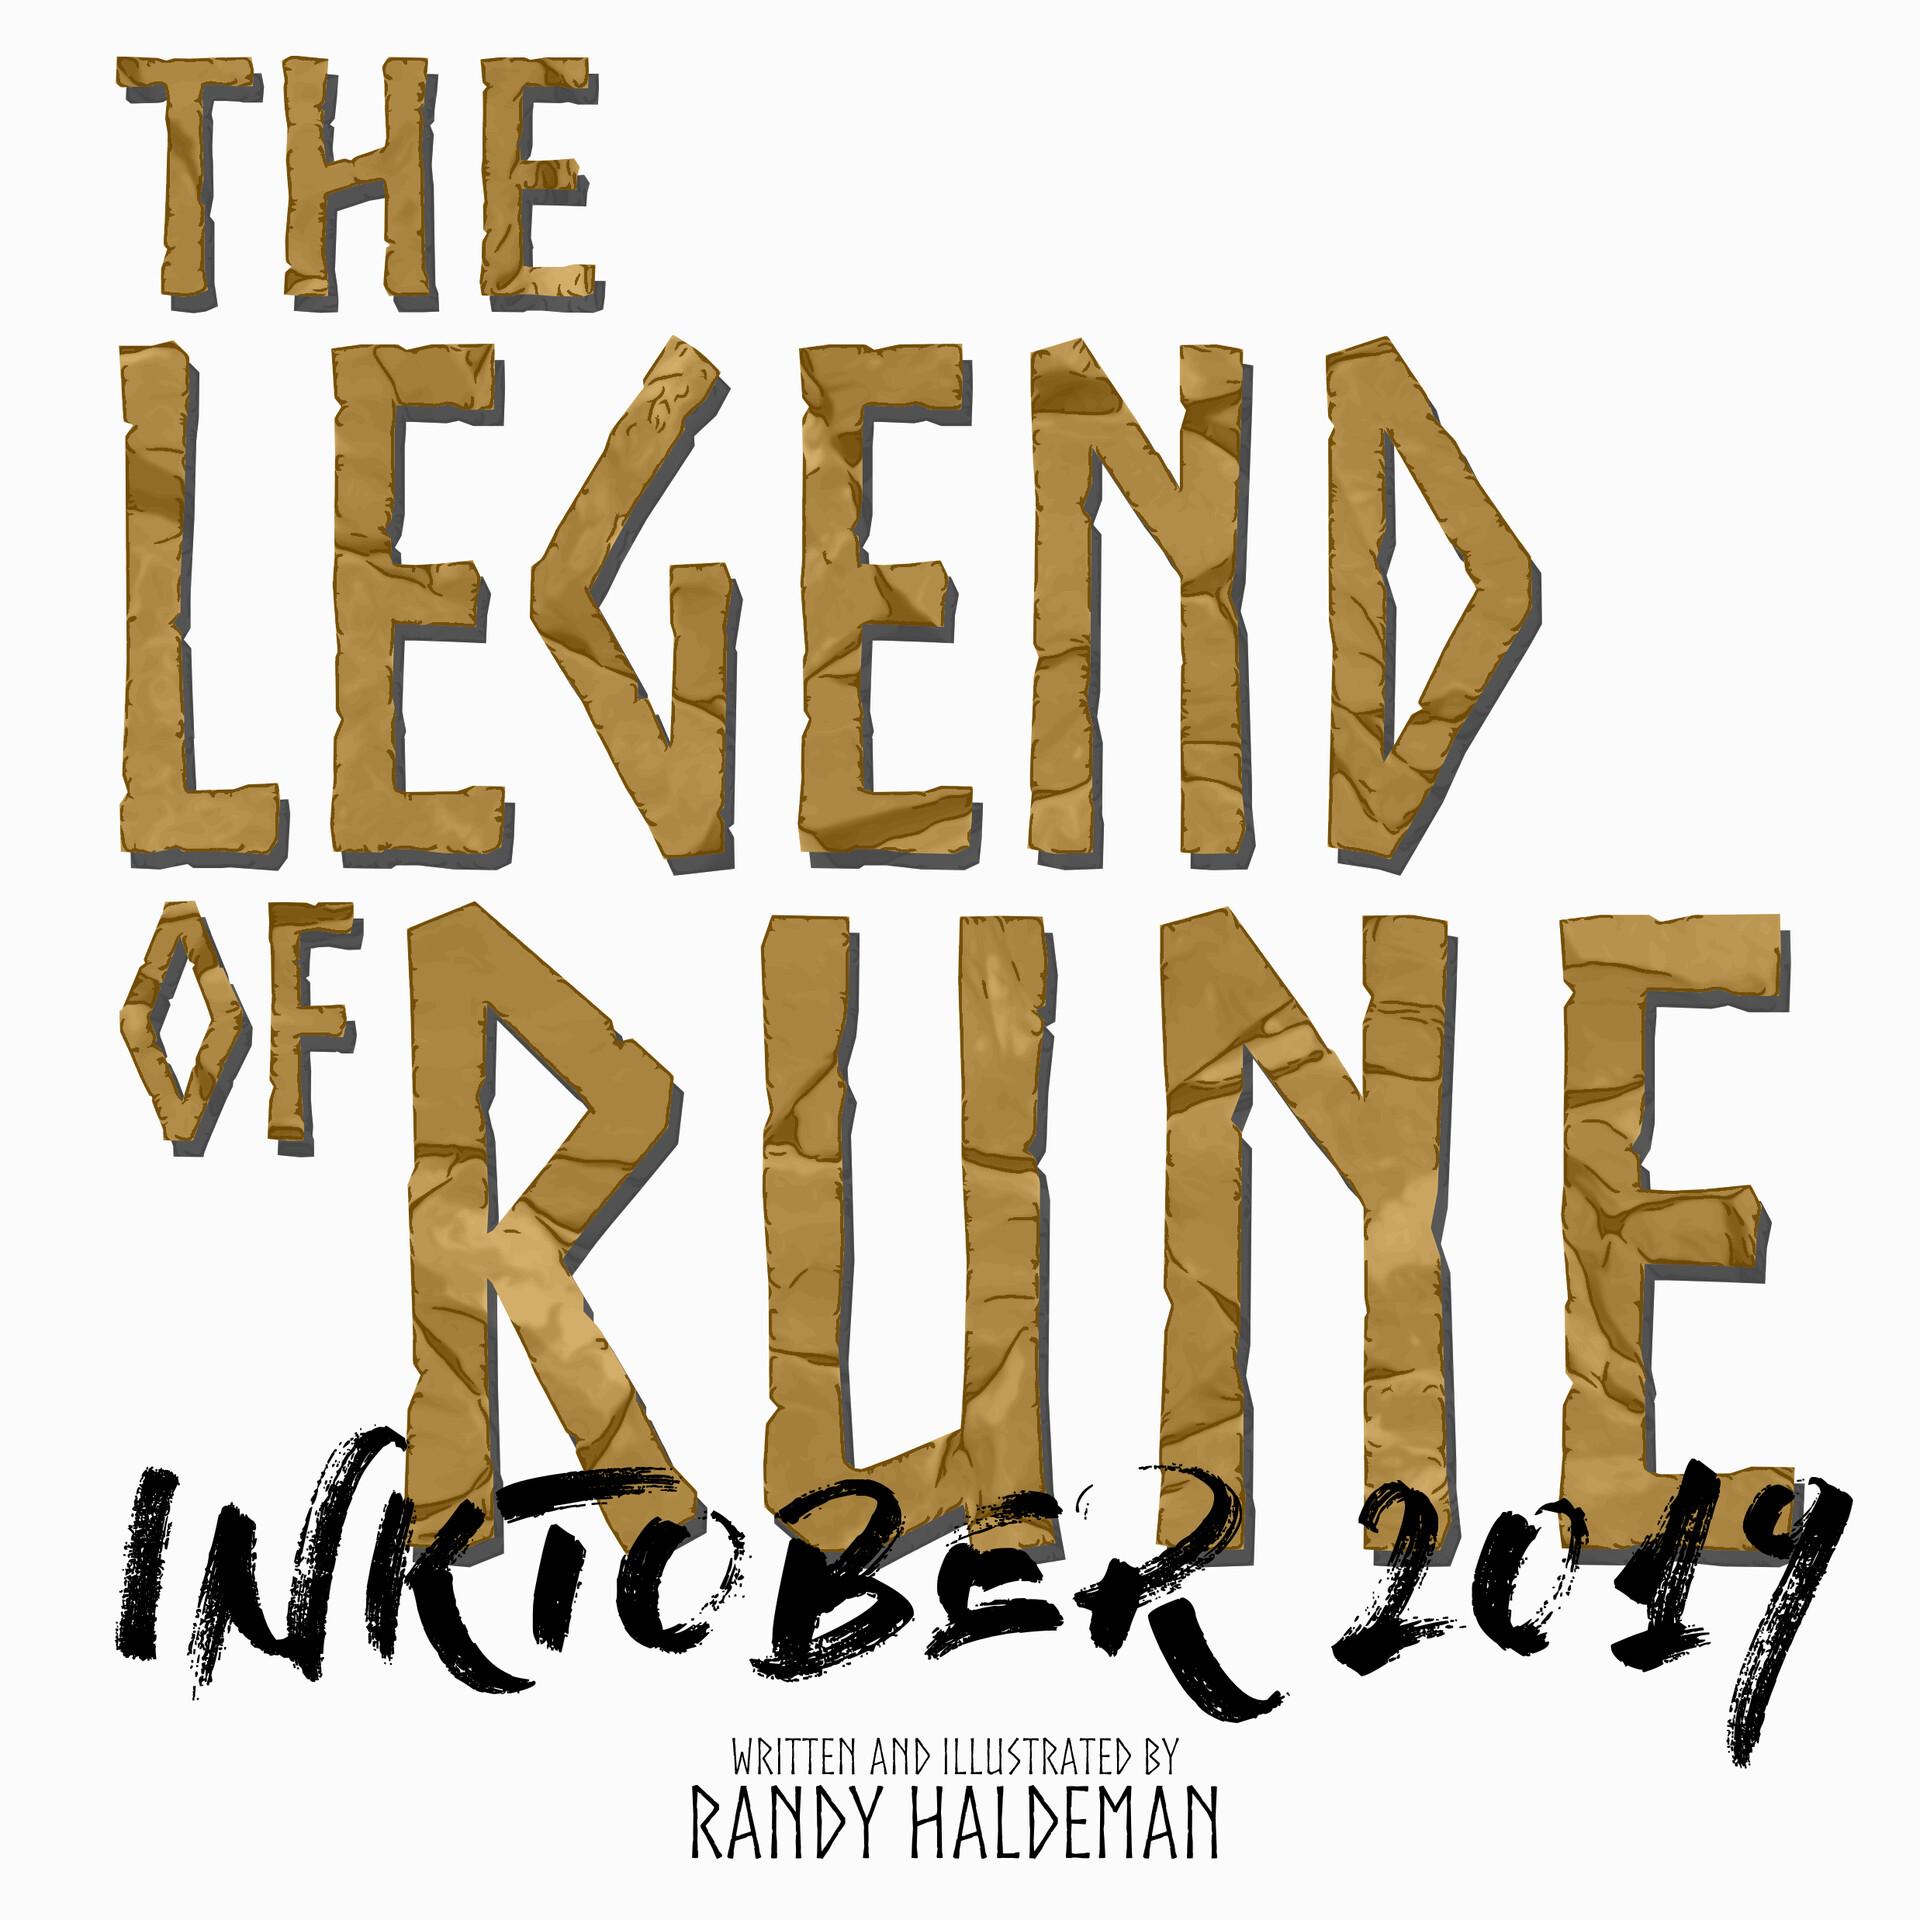 Randy haldeman rune inktober cover